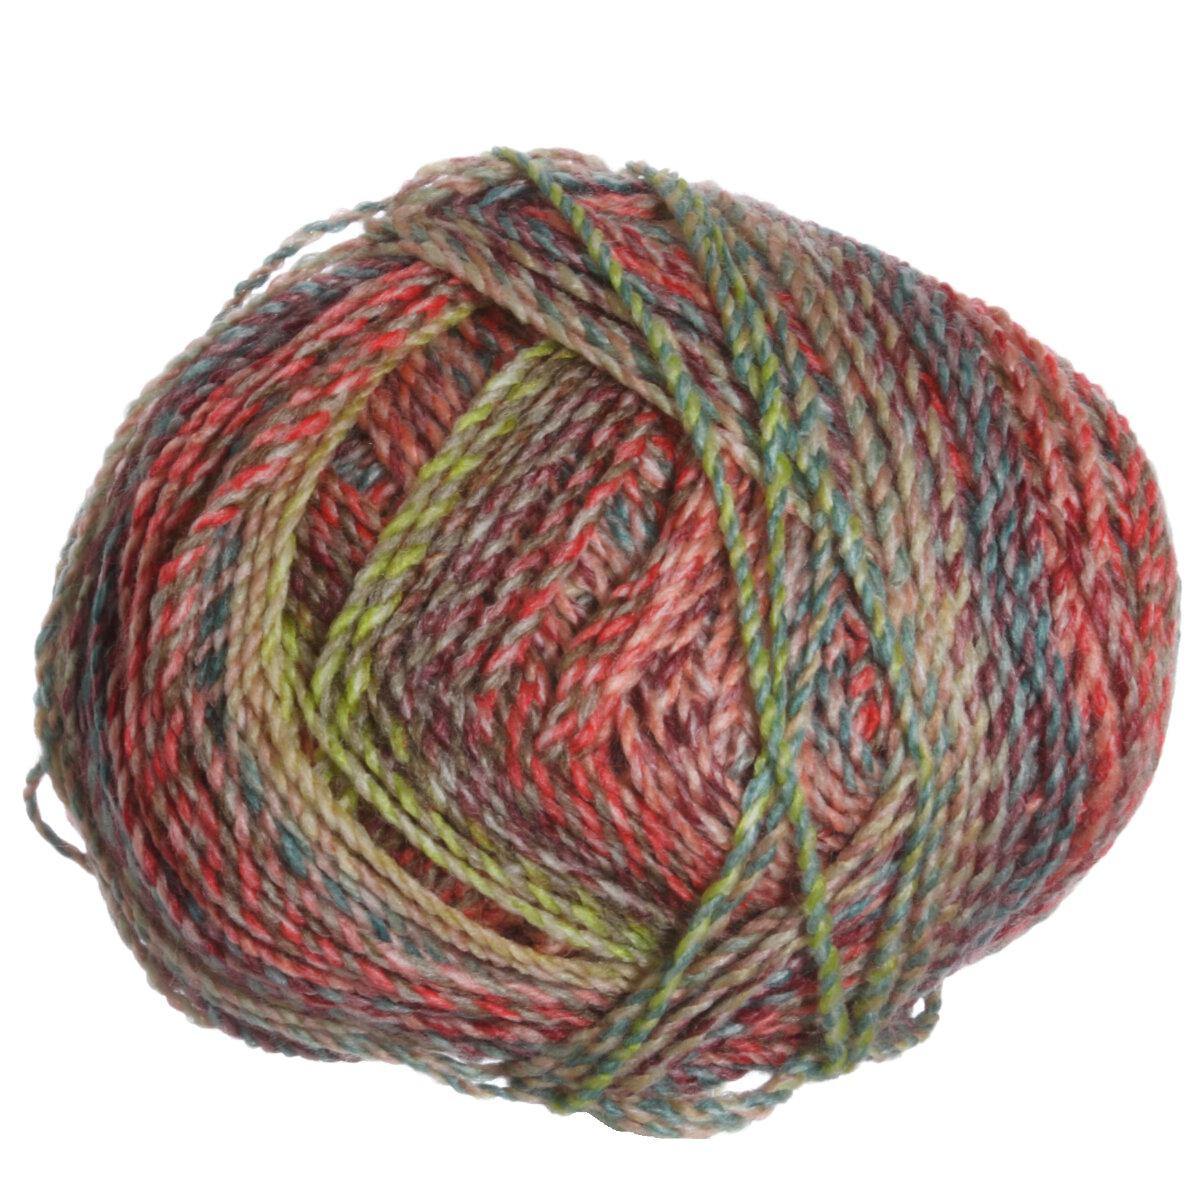 James C. Brett Marble Chunky Yarn - 45 Tropical Peach at Jimmy Beans Wool